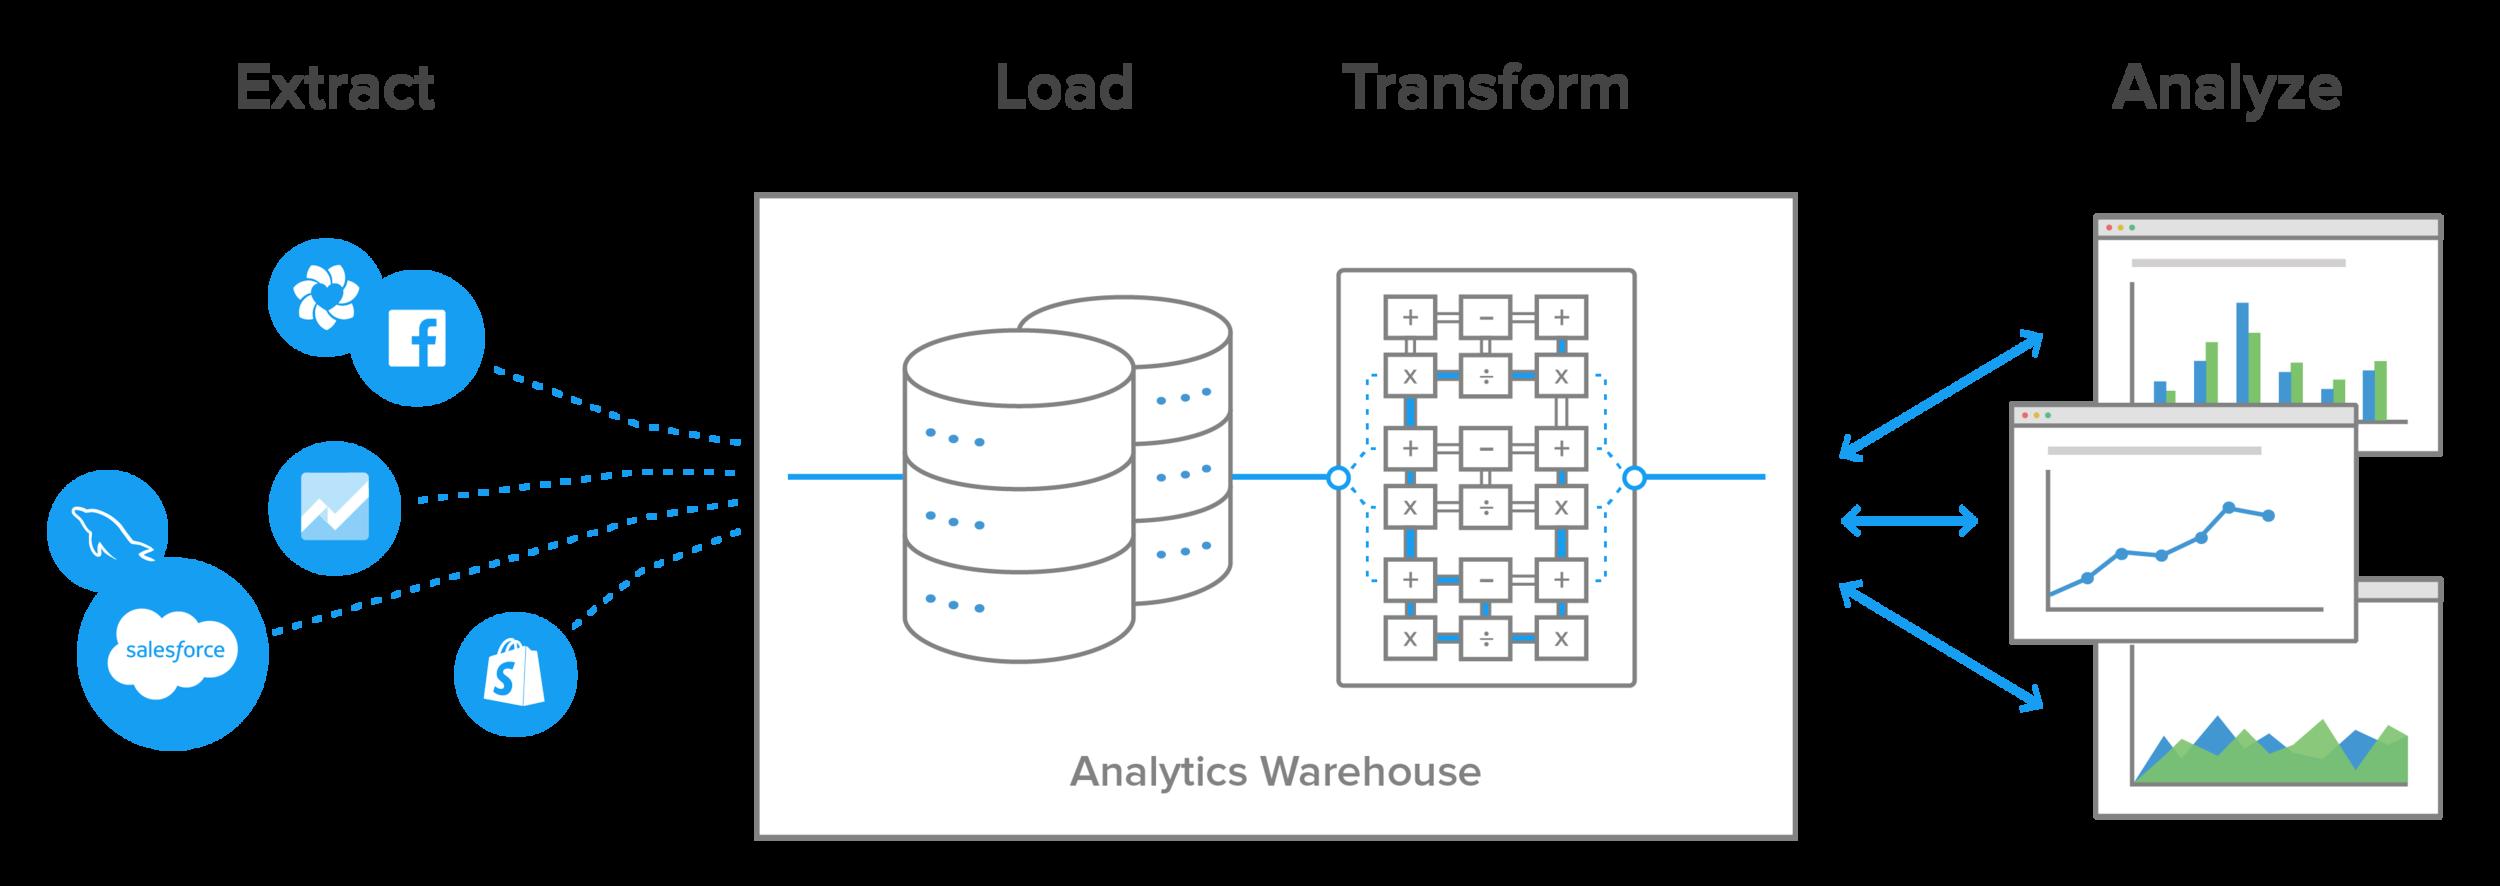 Extract Load Transform Analyze + f II السلبيلا Х 응 Х Х ; Х + + Х Х salesforce S Analytics Warehouse